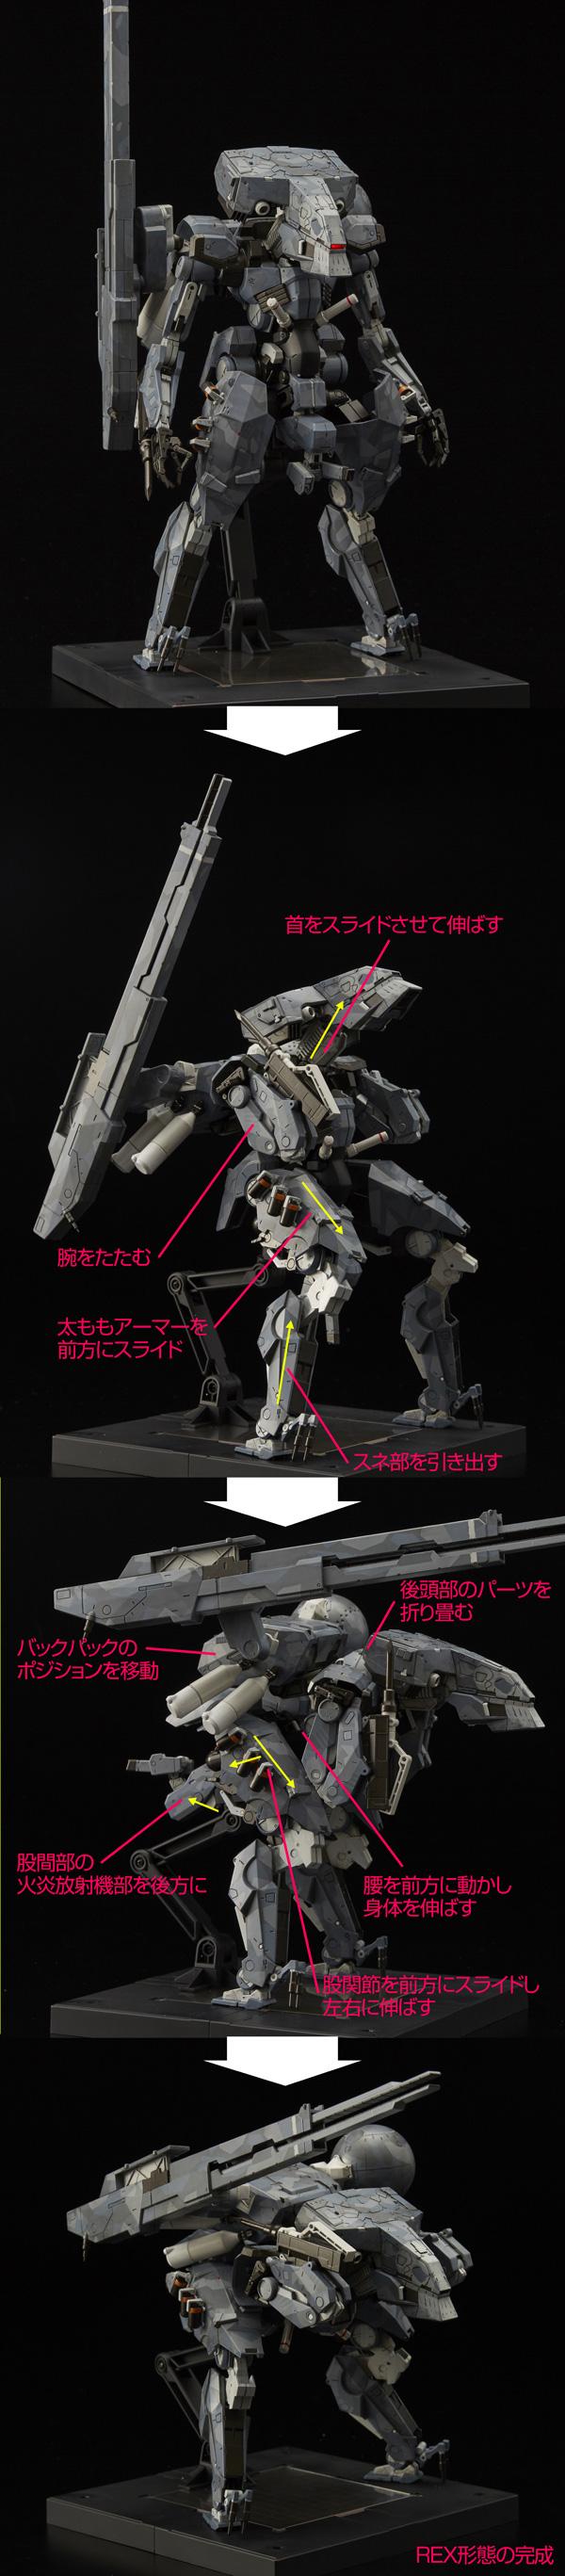 Sentinel-Metal-Gear-Sahelanthrophus-14